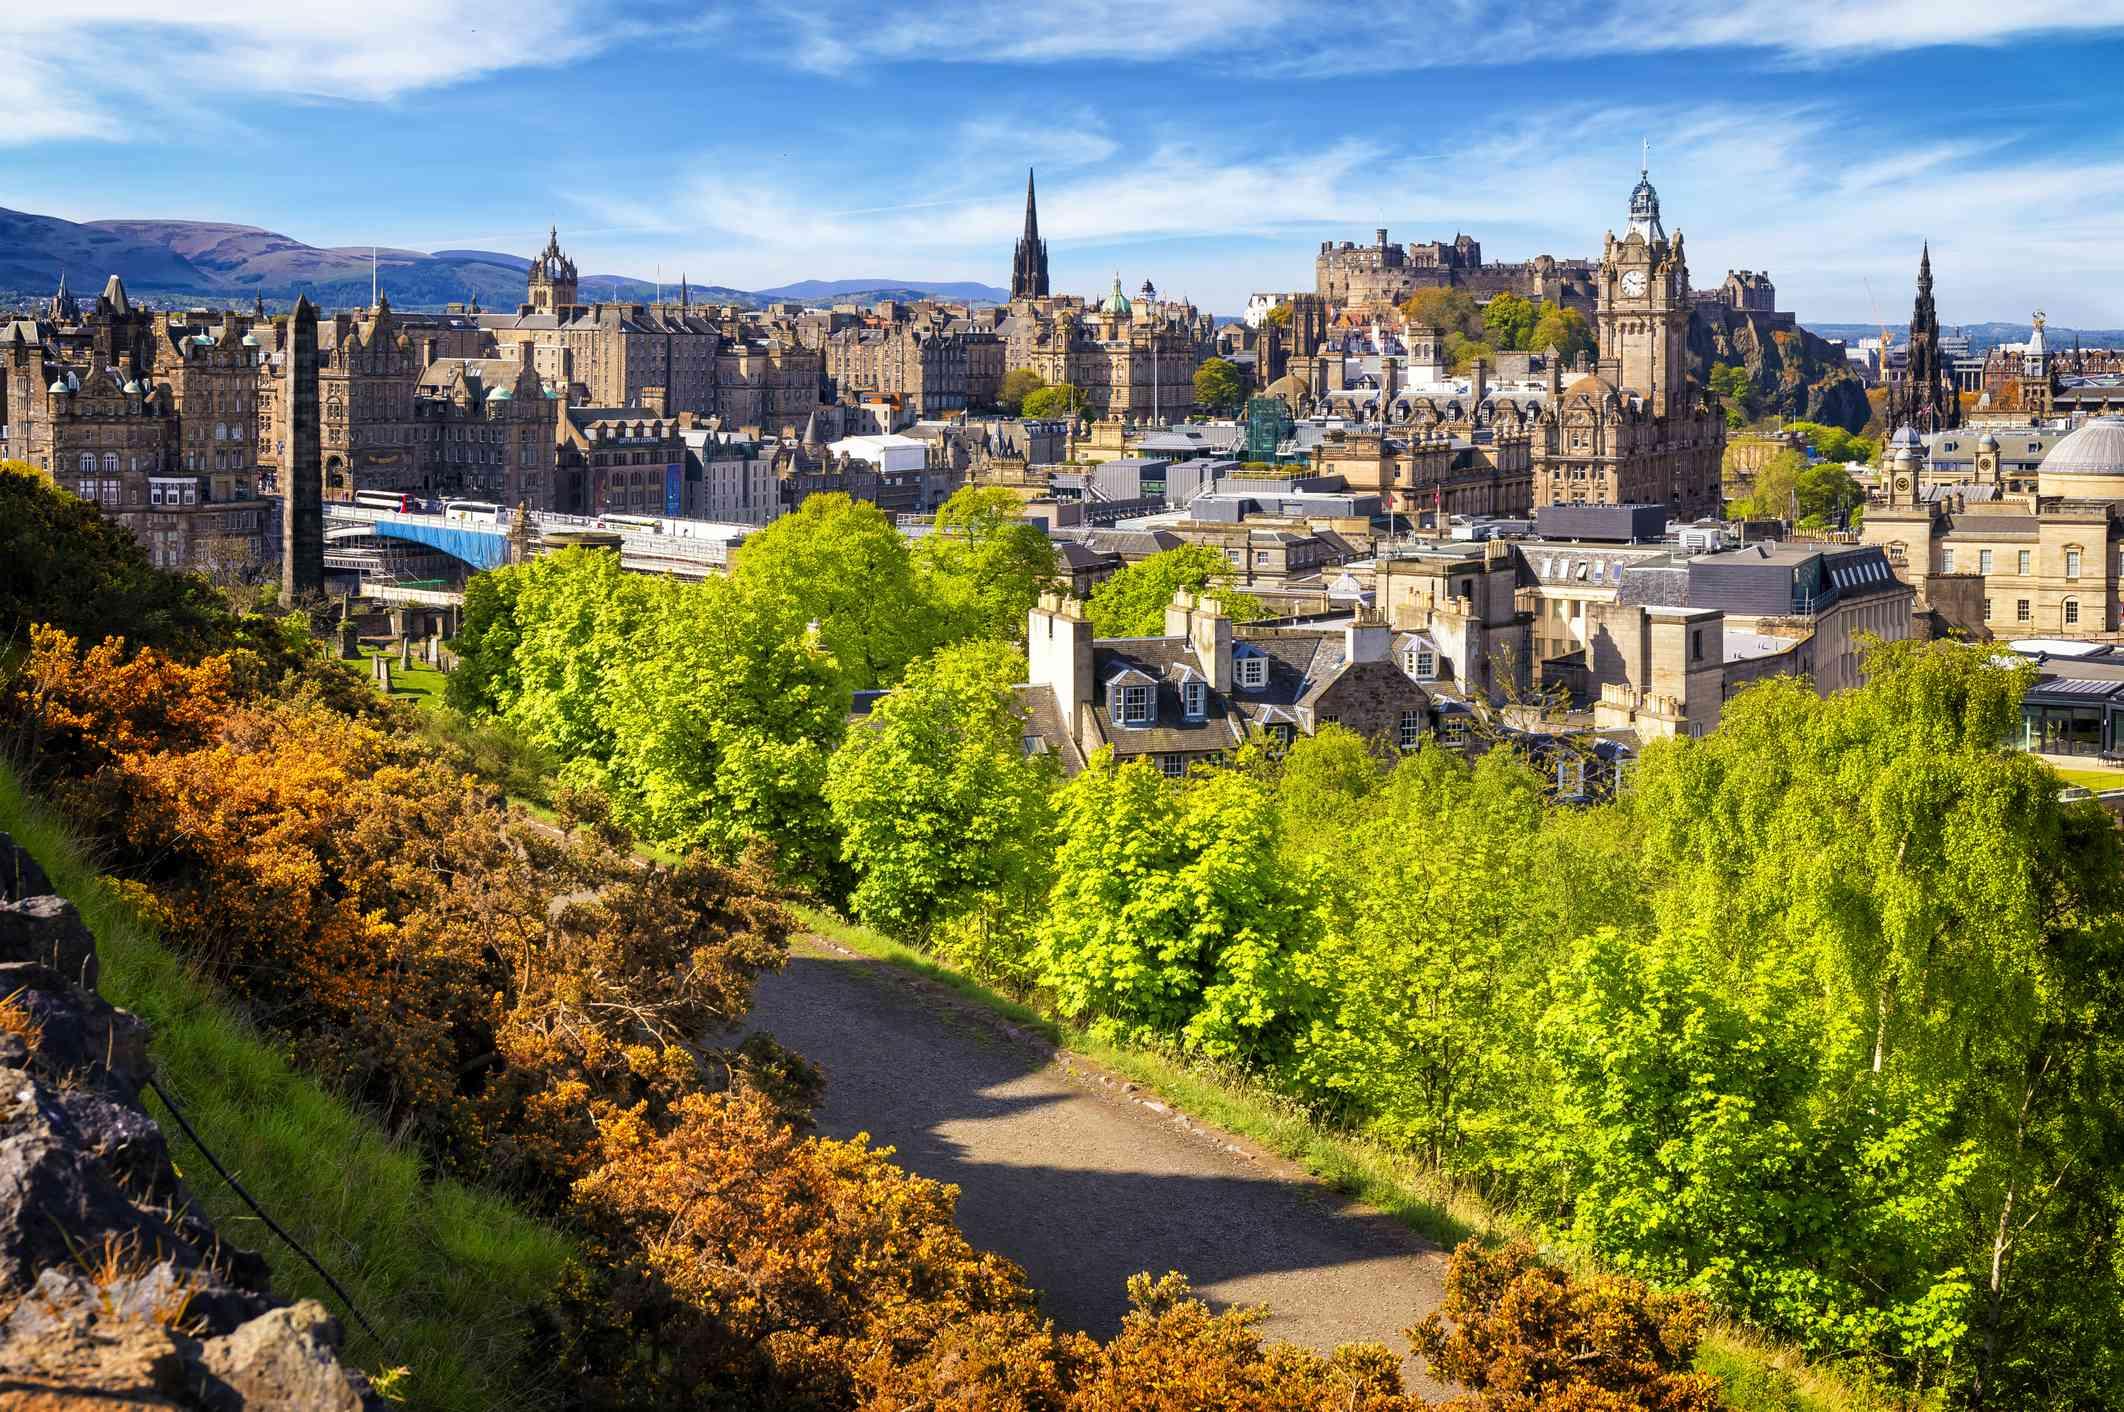 View over historic Edinburgh from Calton Hill, Scotland, UK